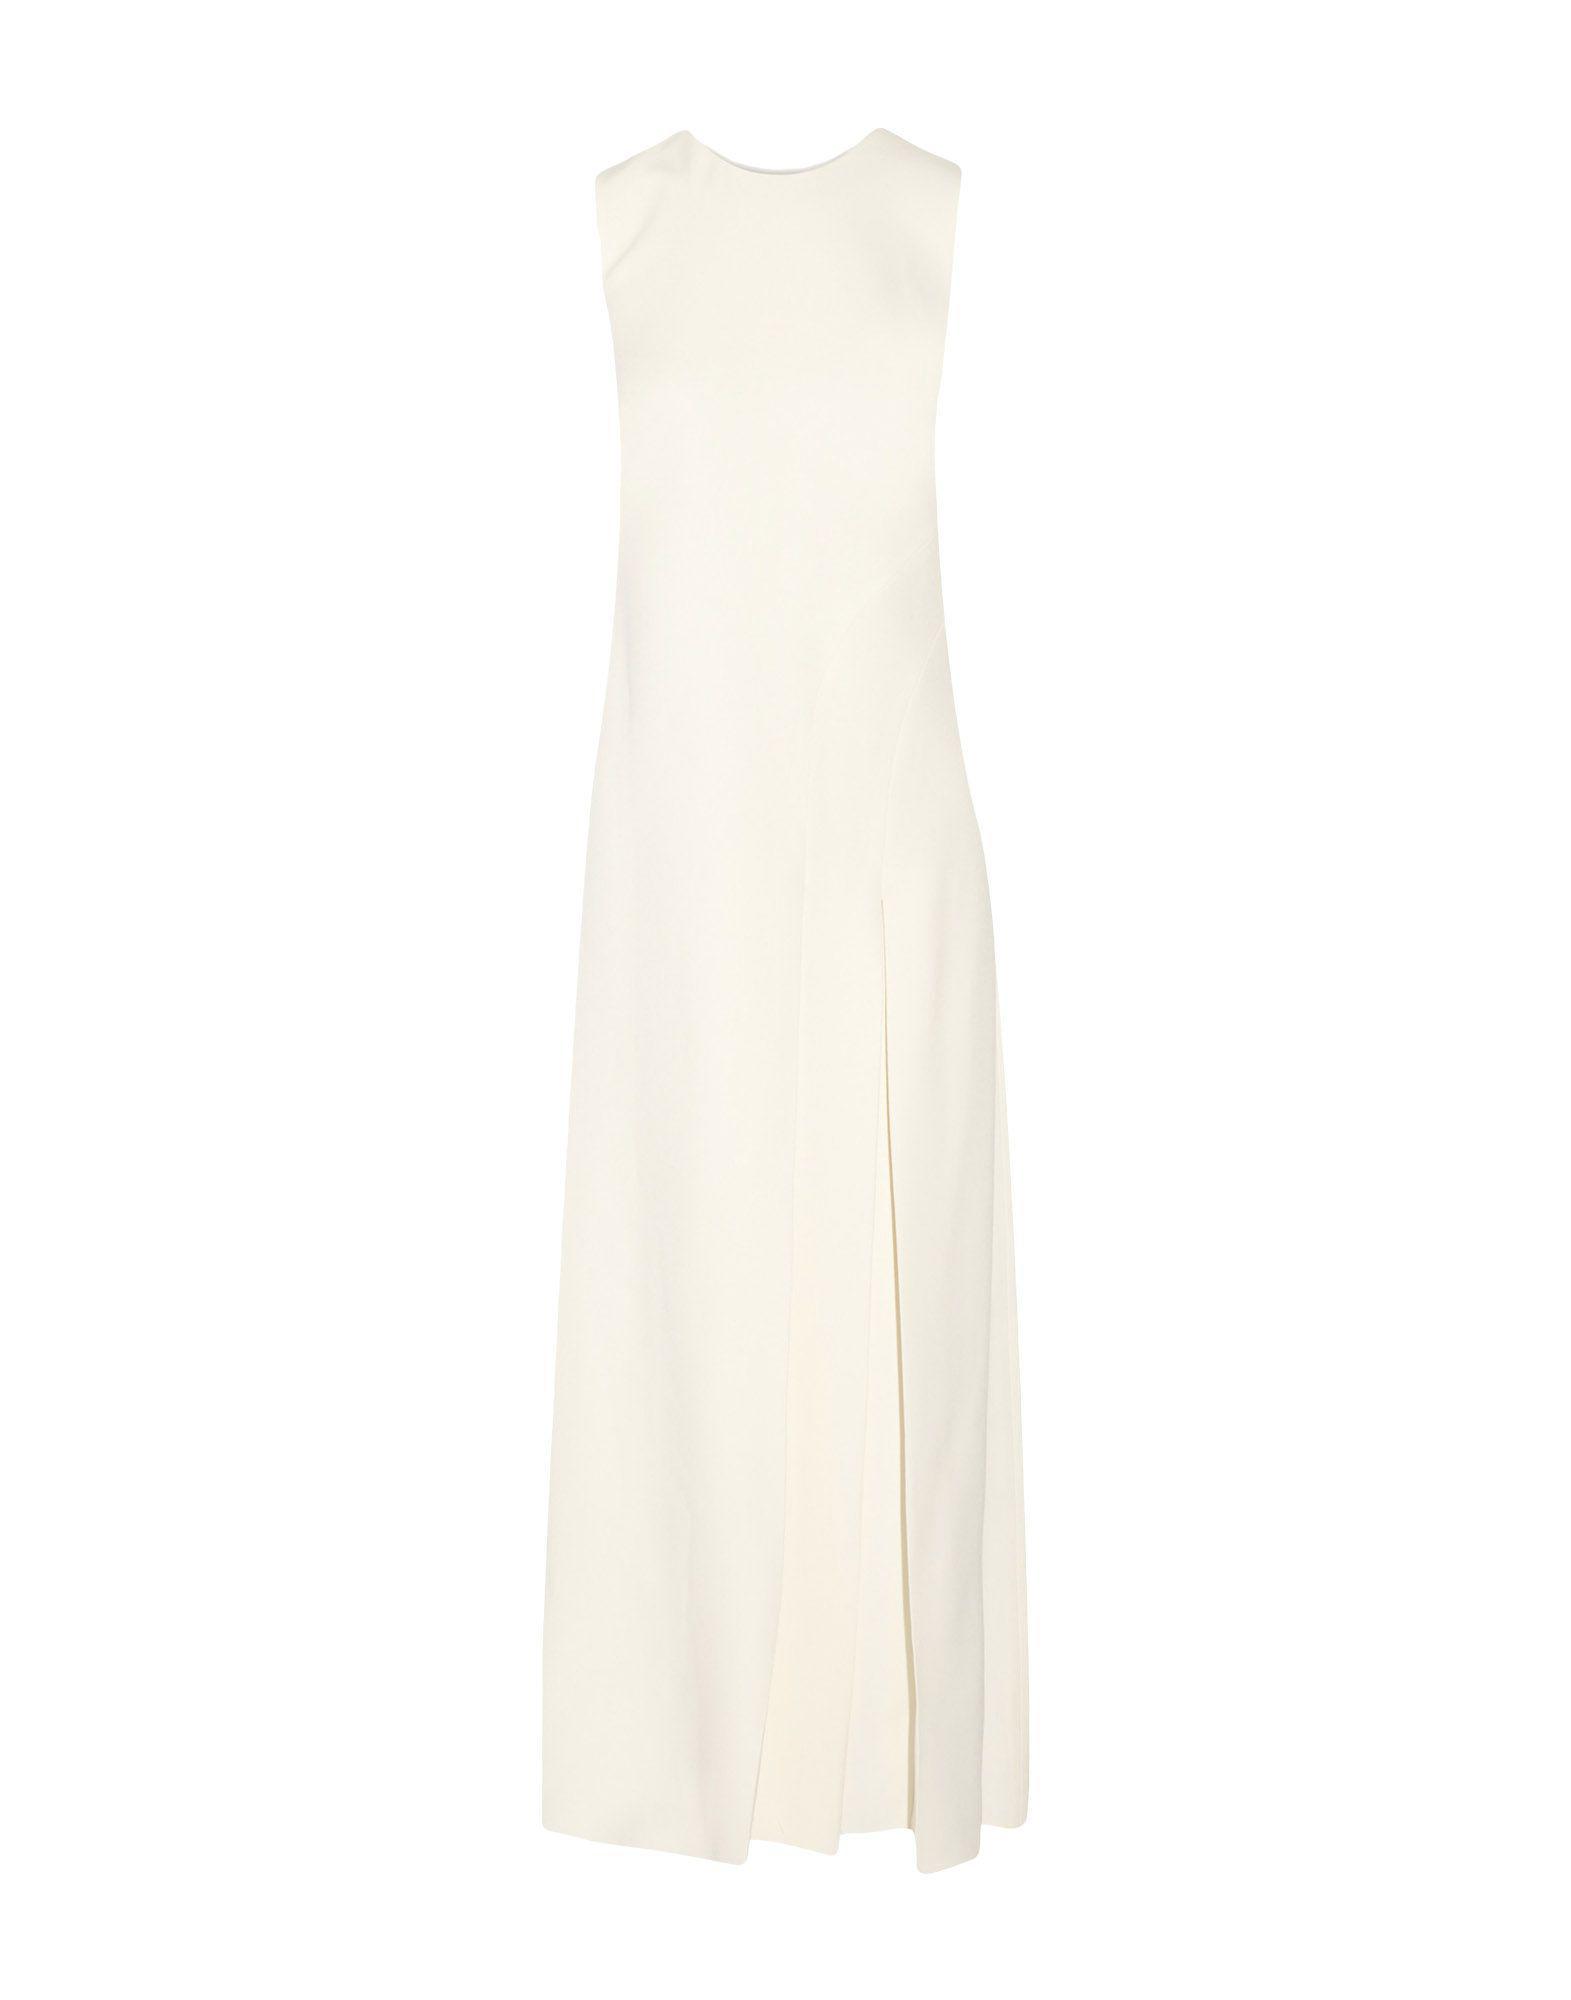 Wes Gordon Women S White Long Dress